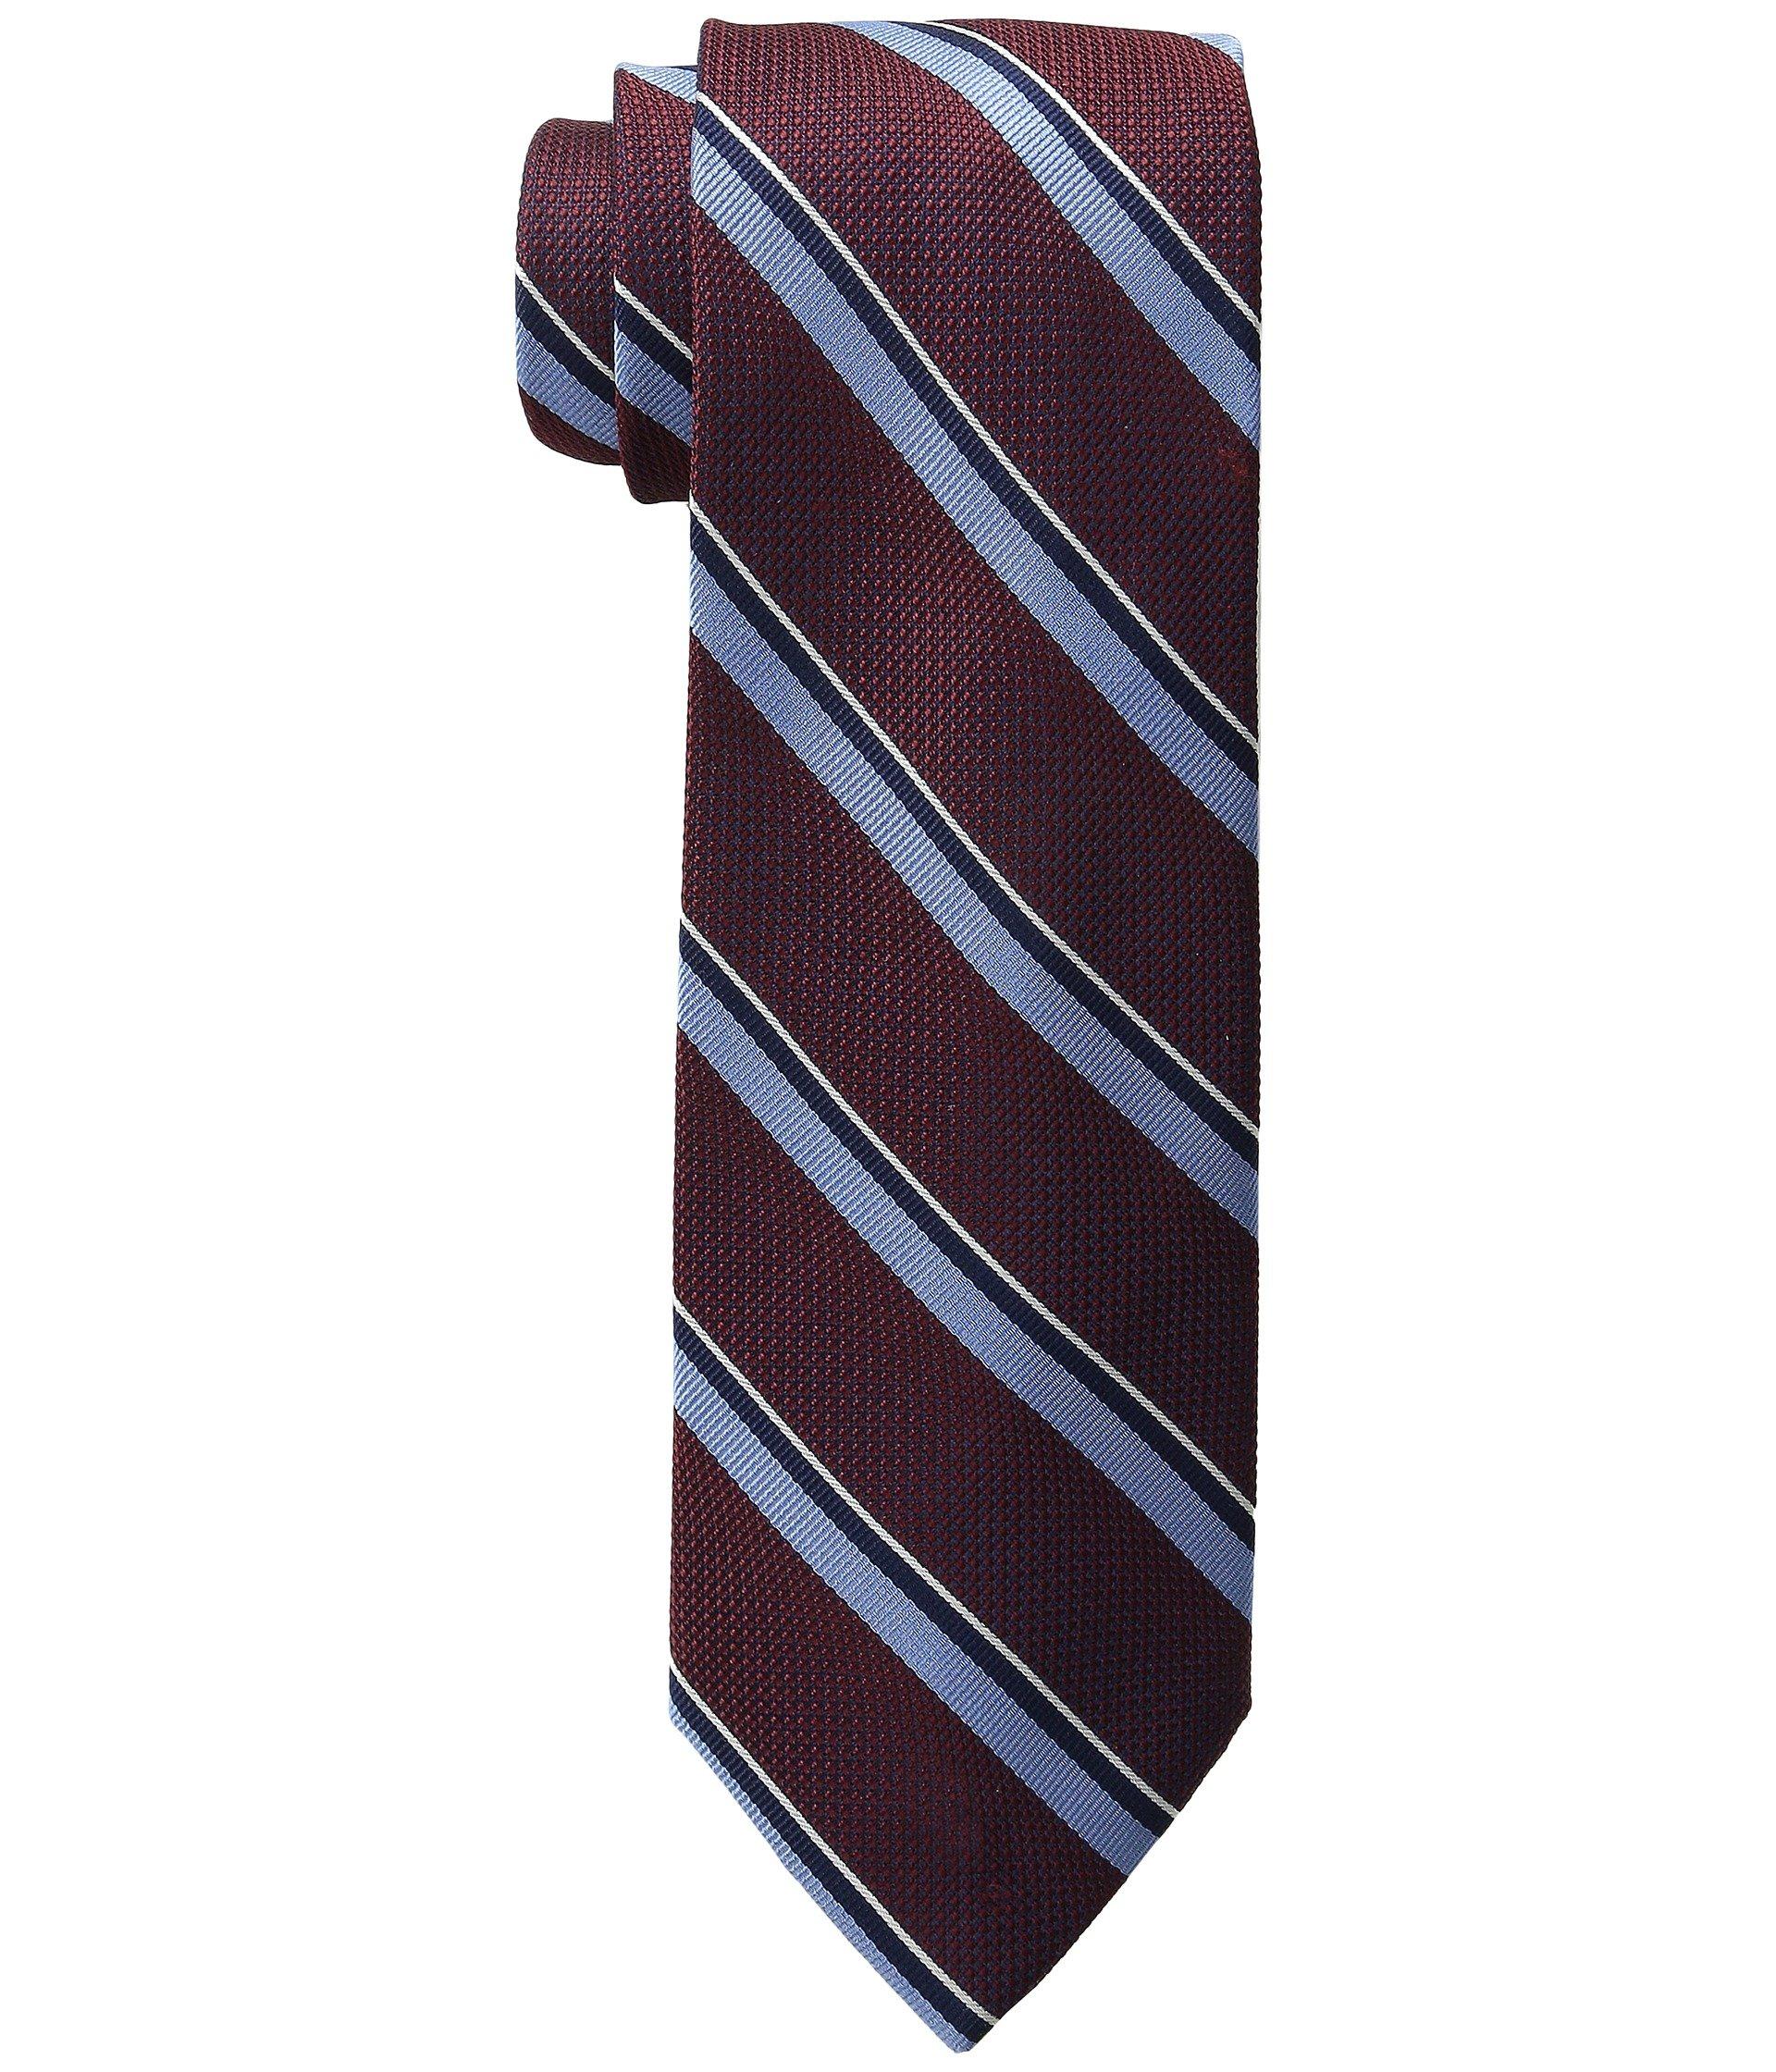 Corbata para Hombre Tommy Hilfiger Grenadine Repp Stripe  + Tommy Hilfiger en VeoyCompro.net